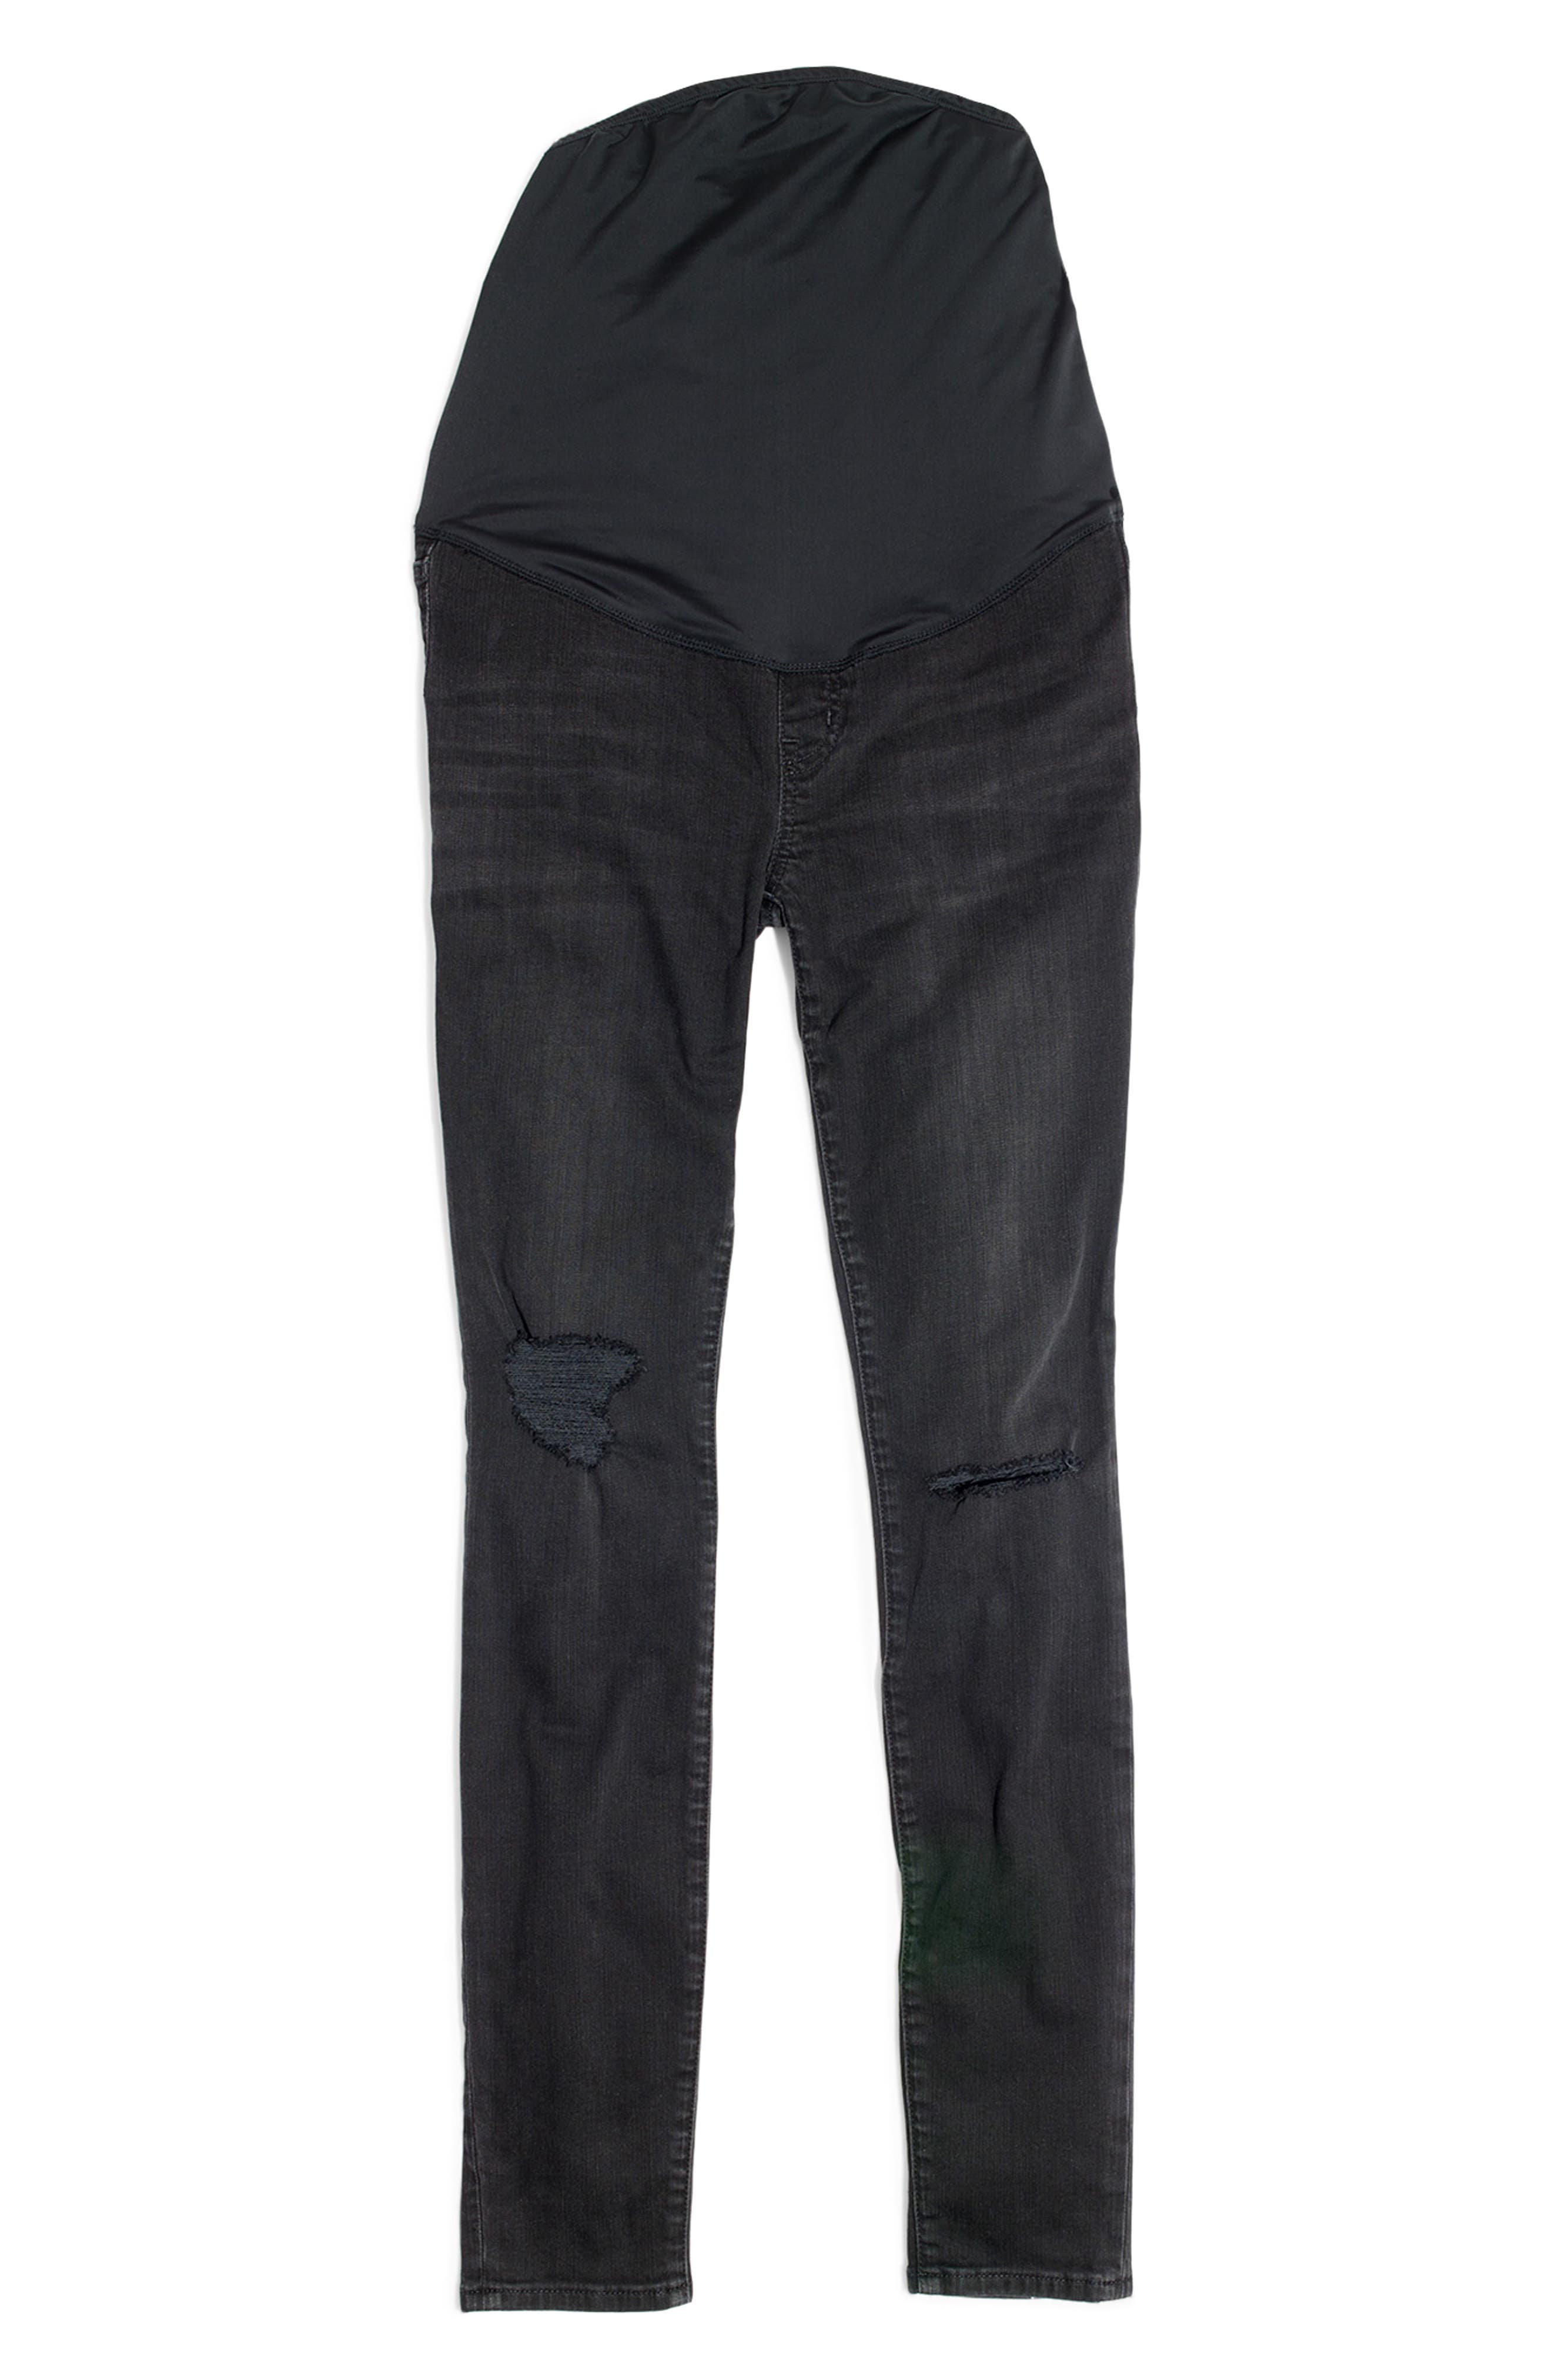 Maternity Skinny Jeans,                             Alternate thumbnail 4, color,                             009